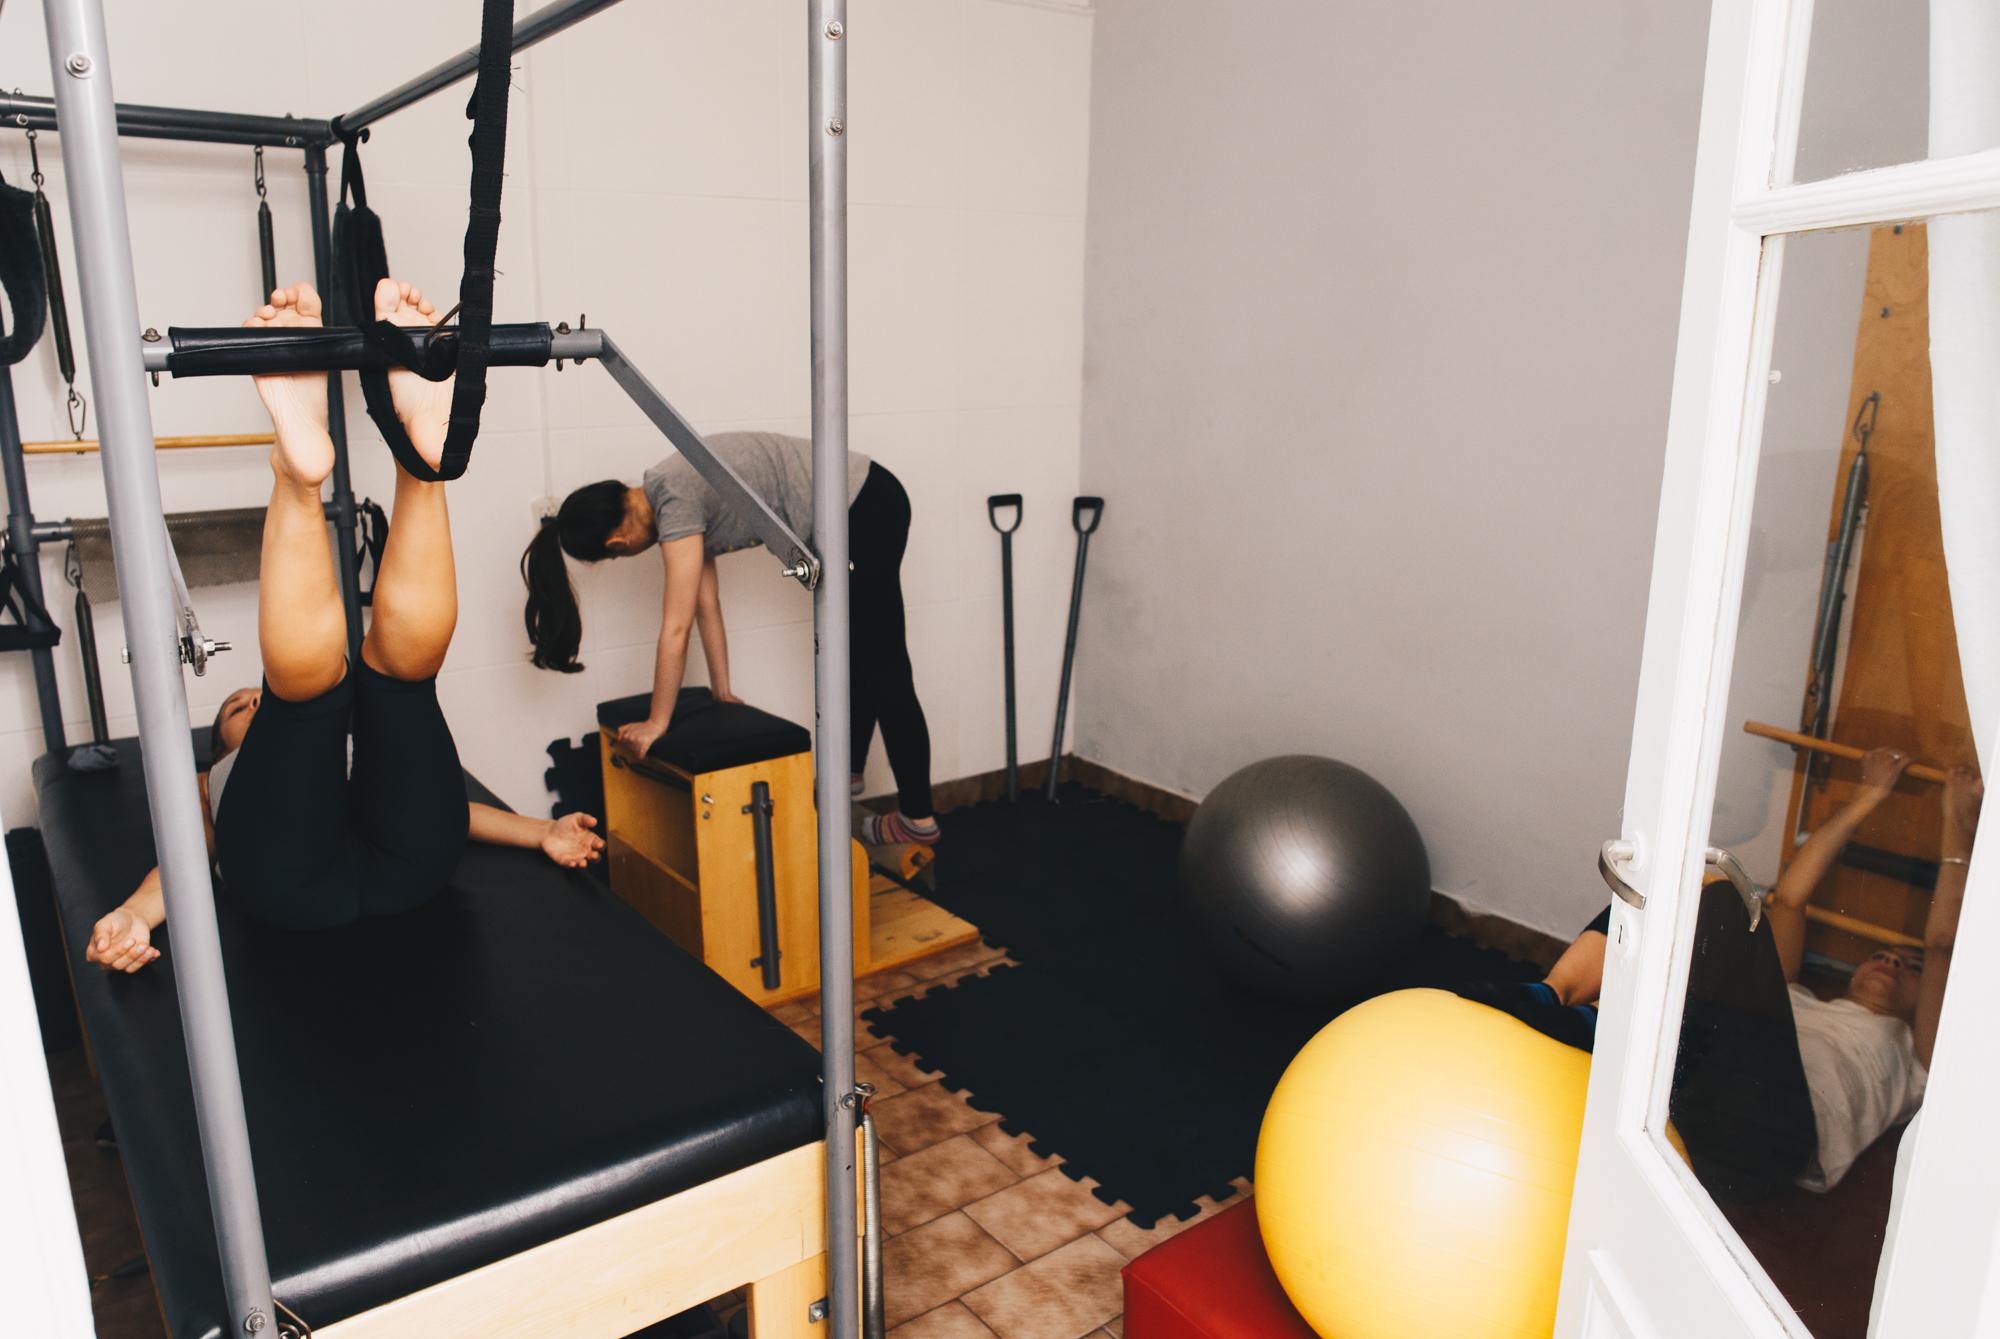 Circuito Gym : Circuito trx youtube